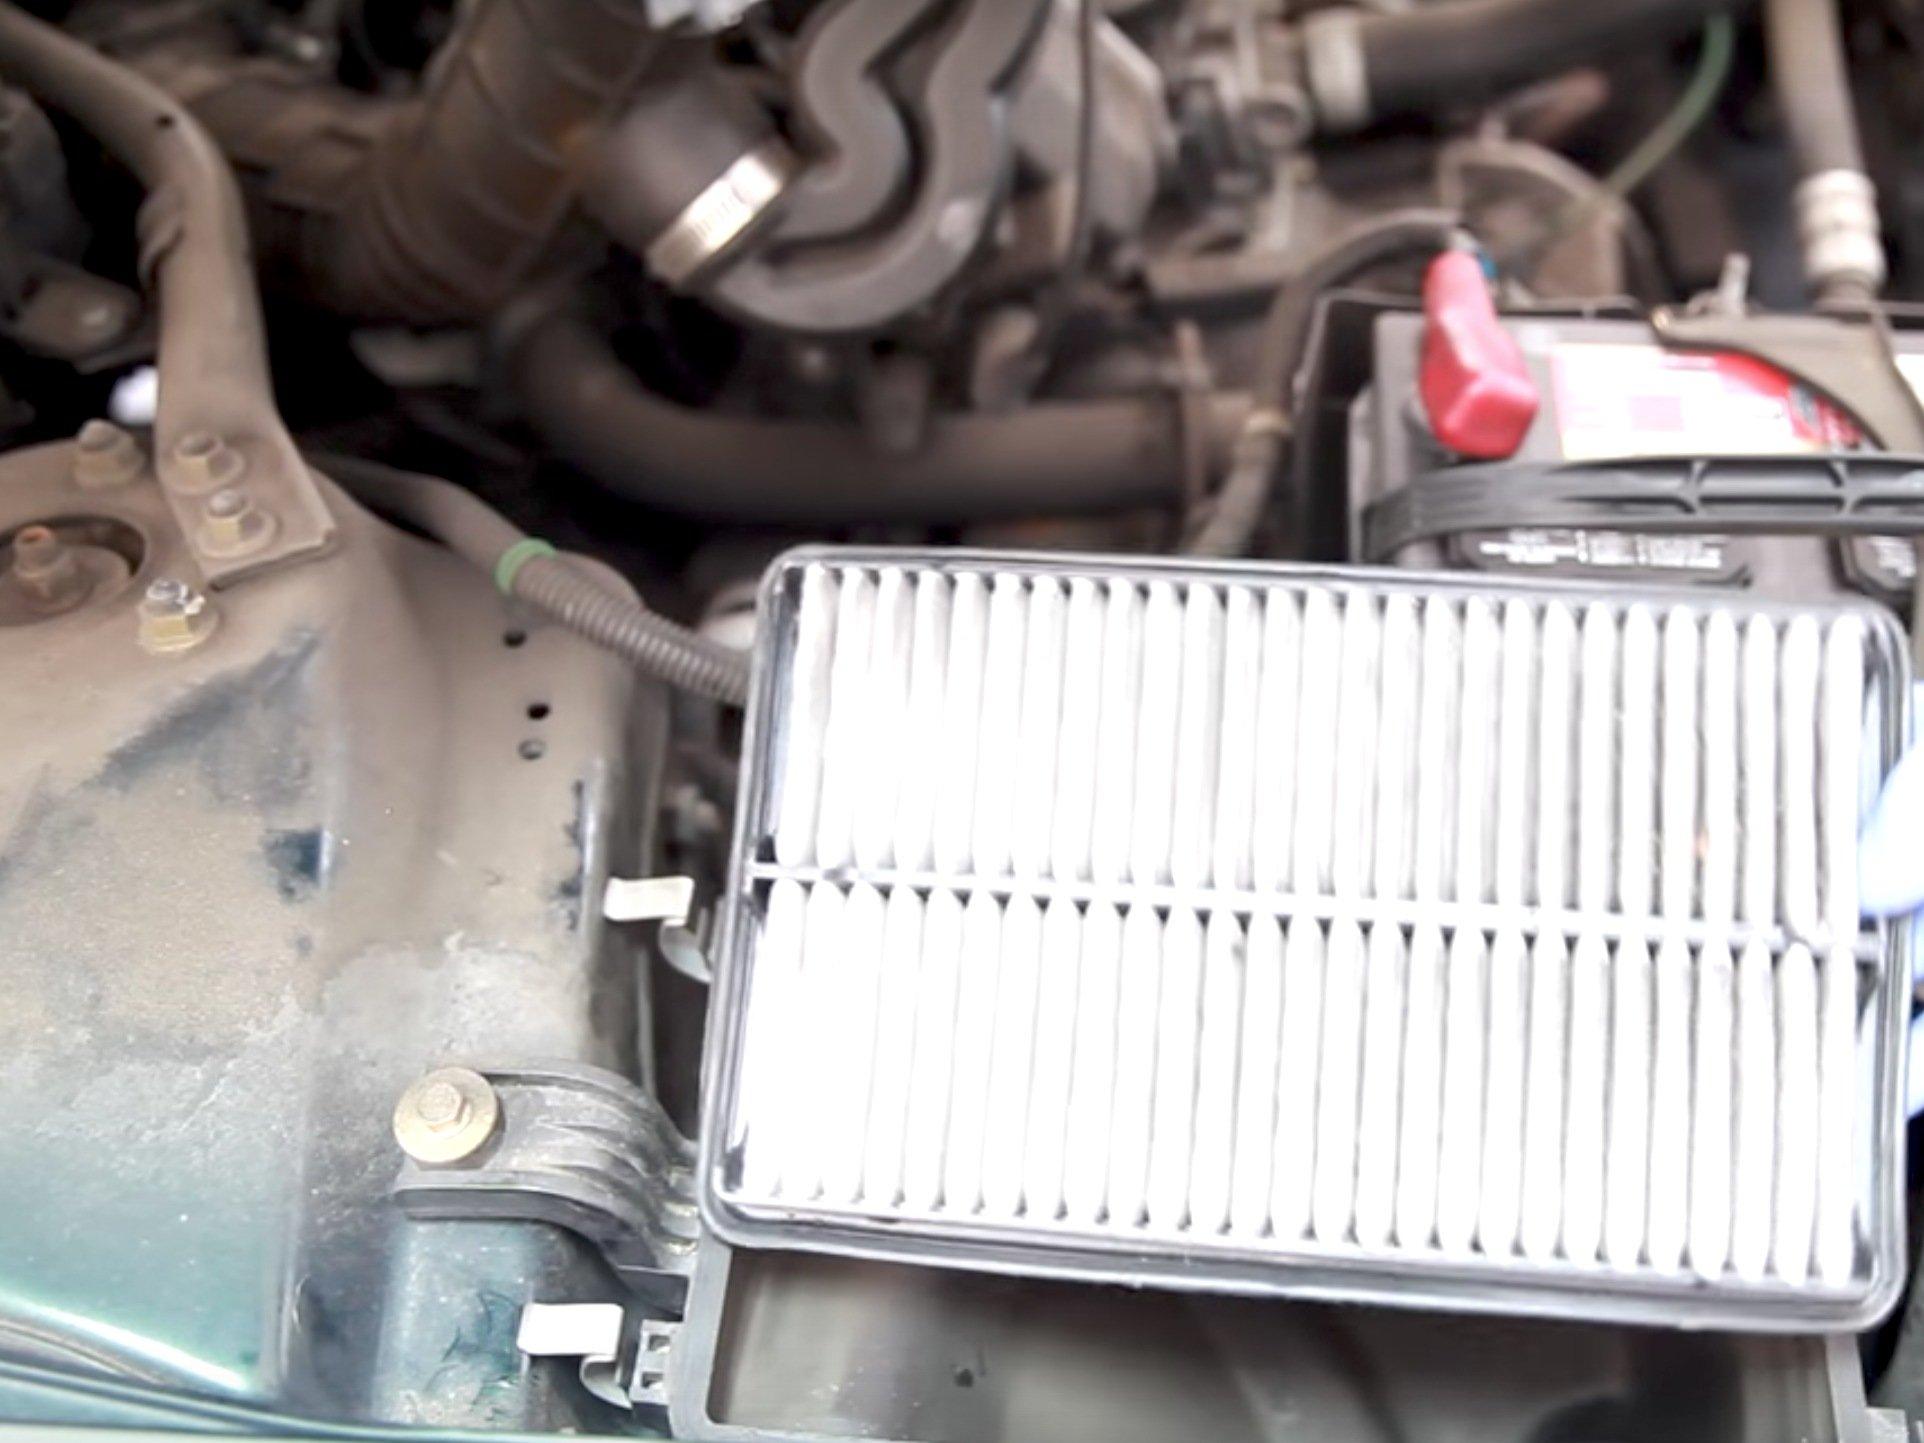 2000 honda accord fuel filter 1998 2002 honda accord engine air filter replacement  1998  1999 2000 honda accord 3.0 fuel filter location 1998 2002 honda accord engine air